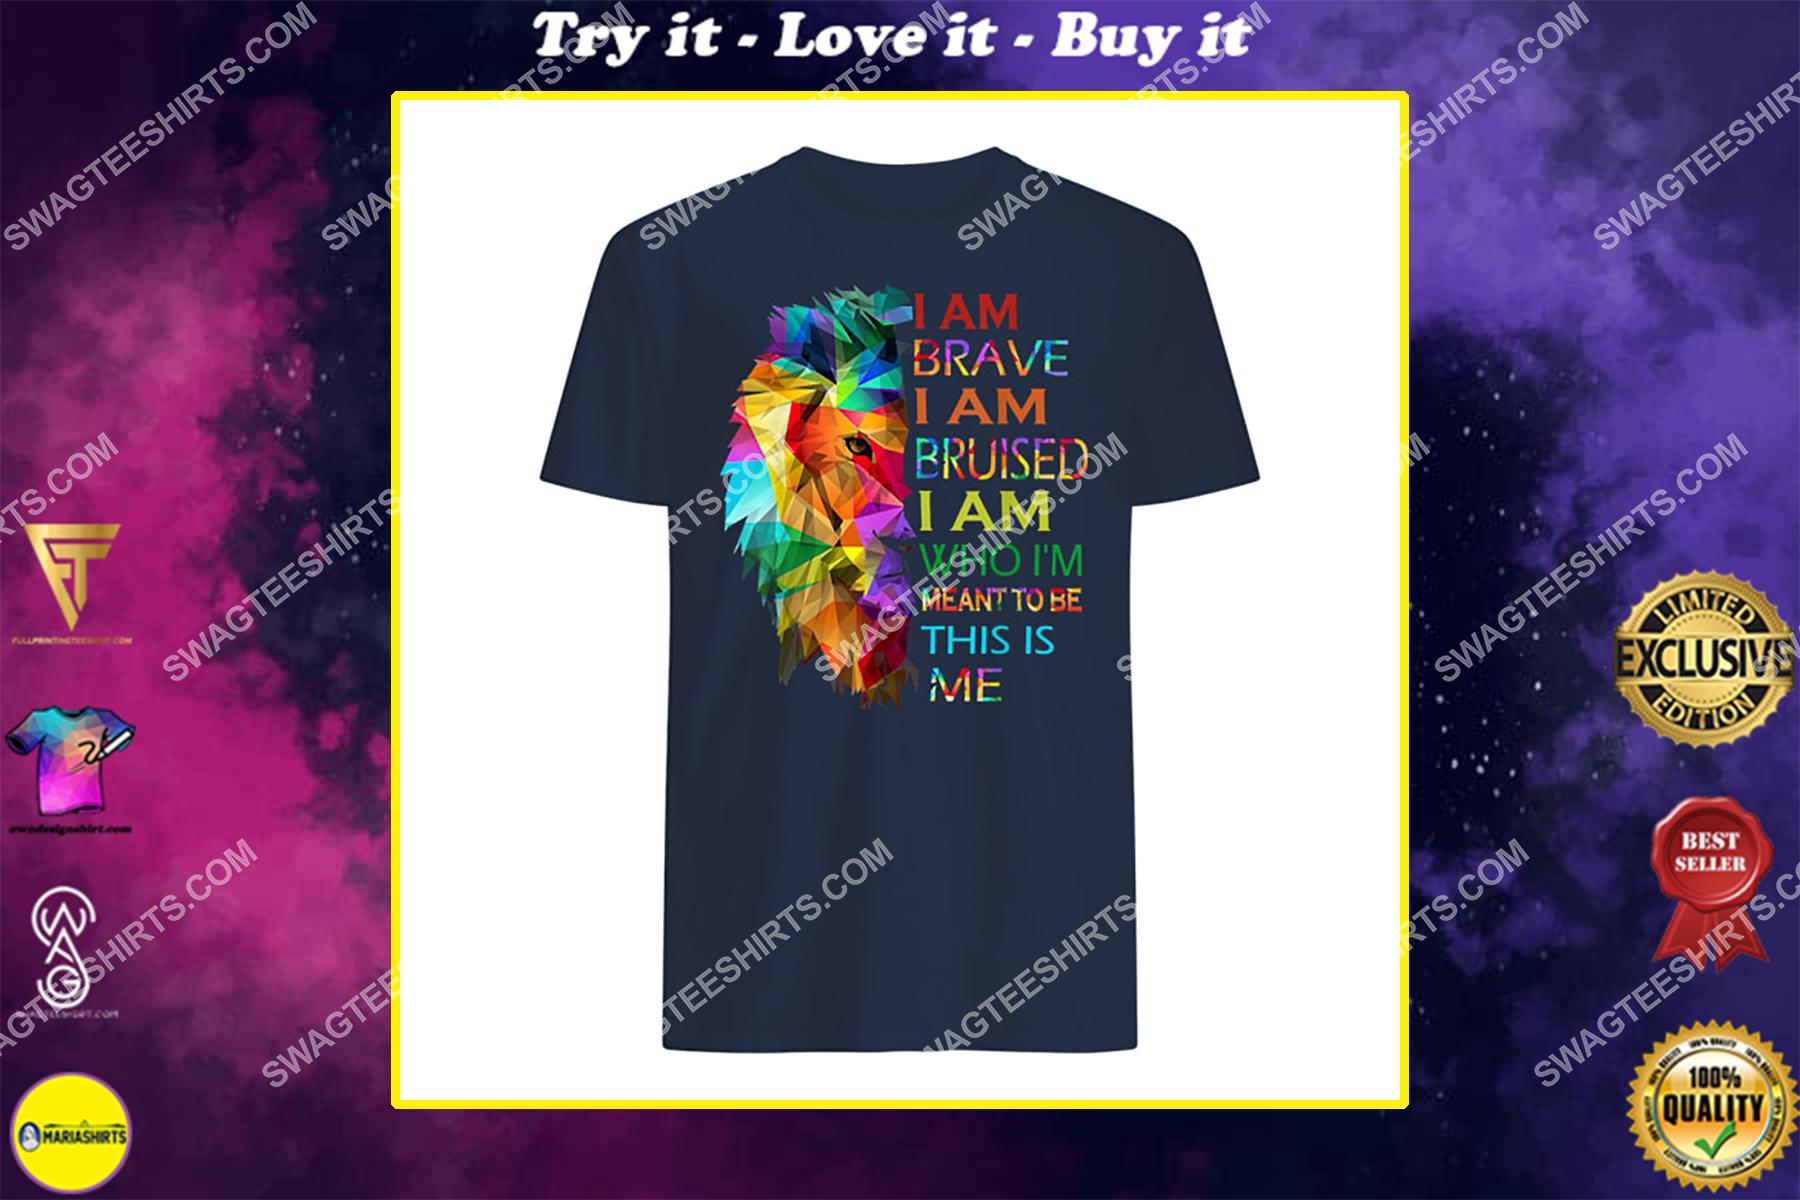 i am brave i am bruised i am who i'm meant to be this is me lgbt pride shirt